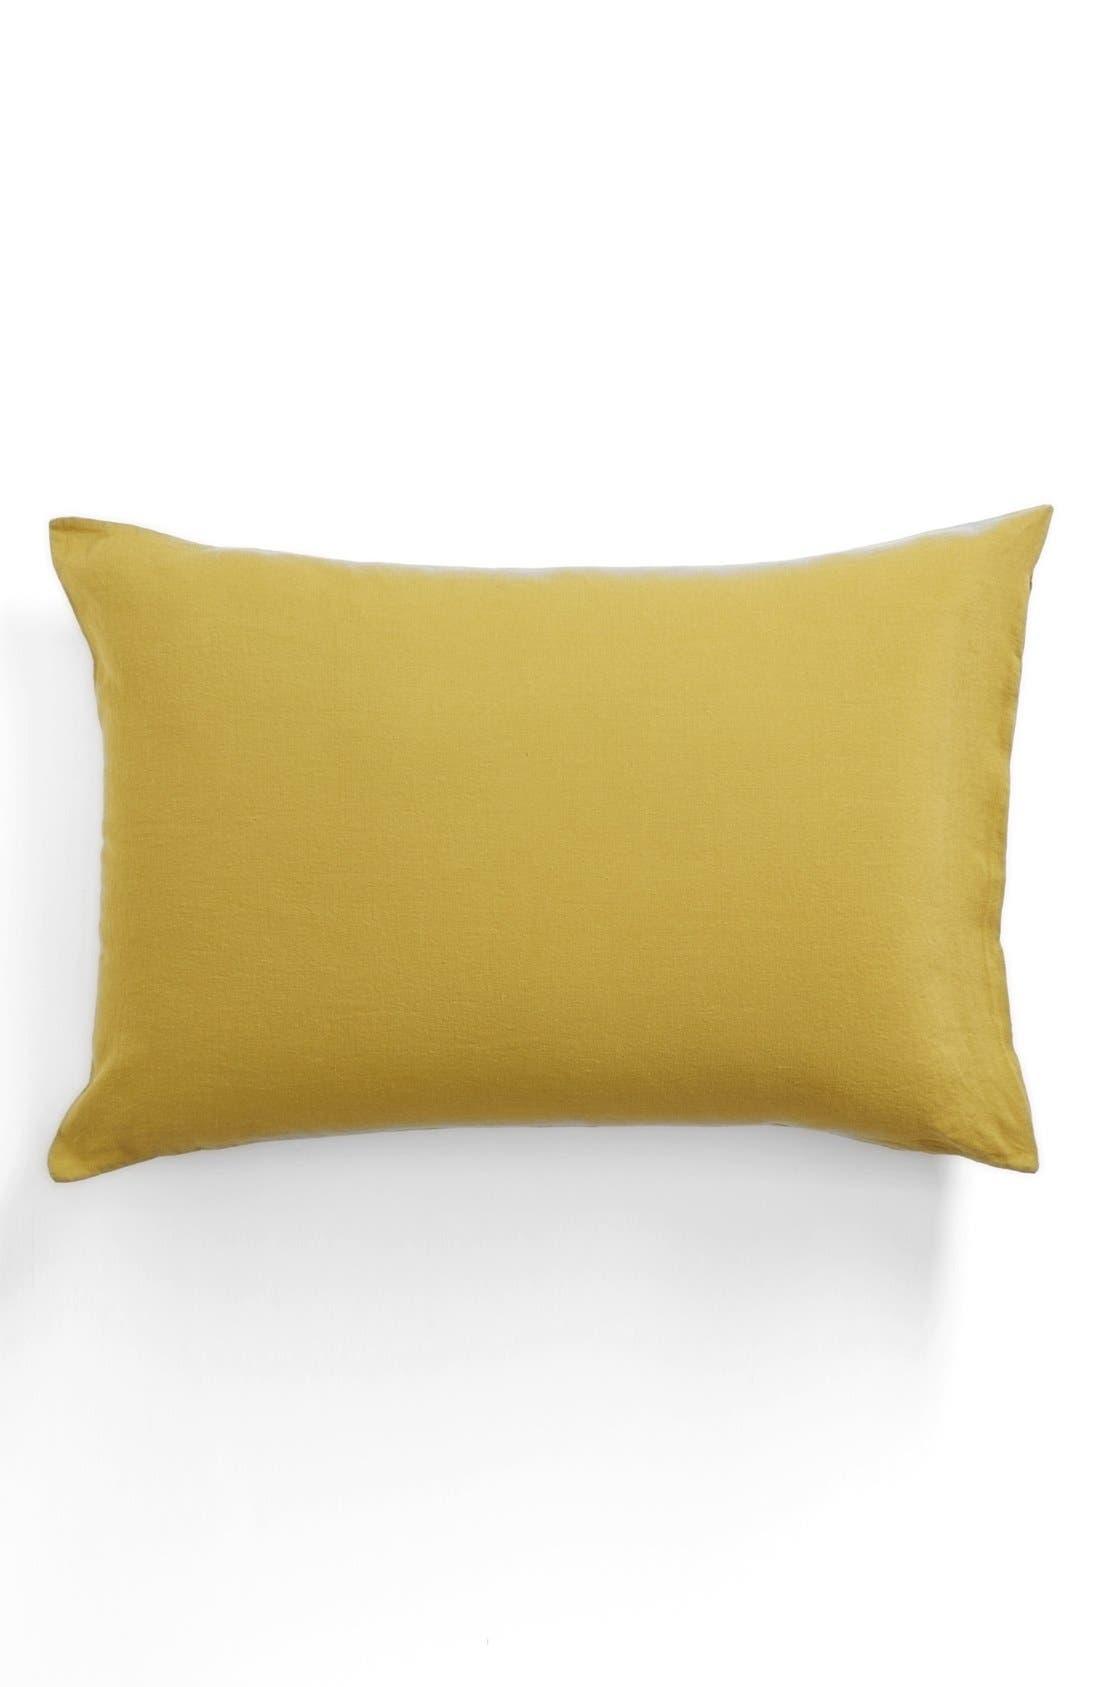 Main Image - Merci Washed Linen Pillowcase